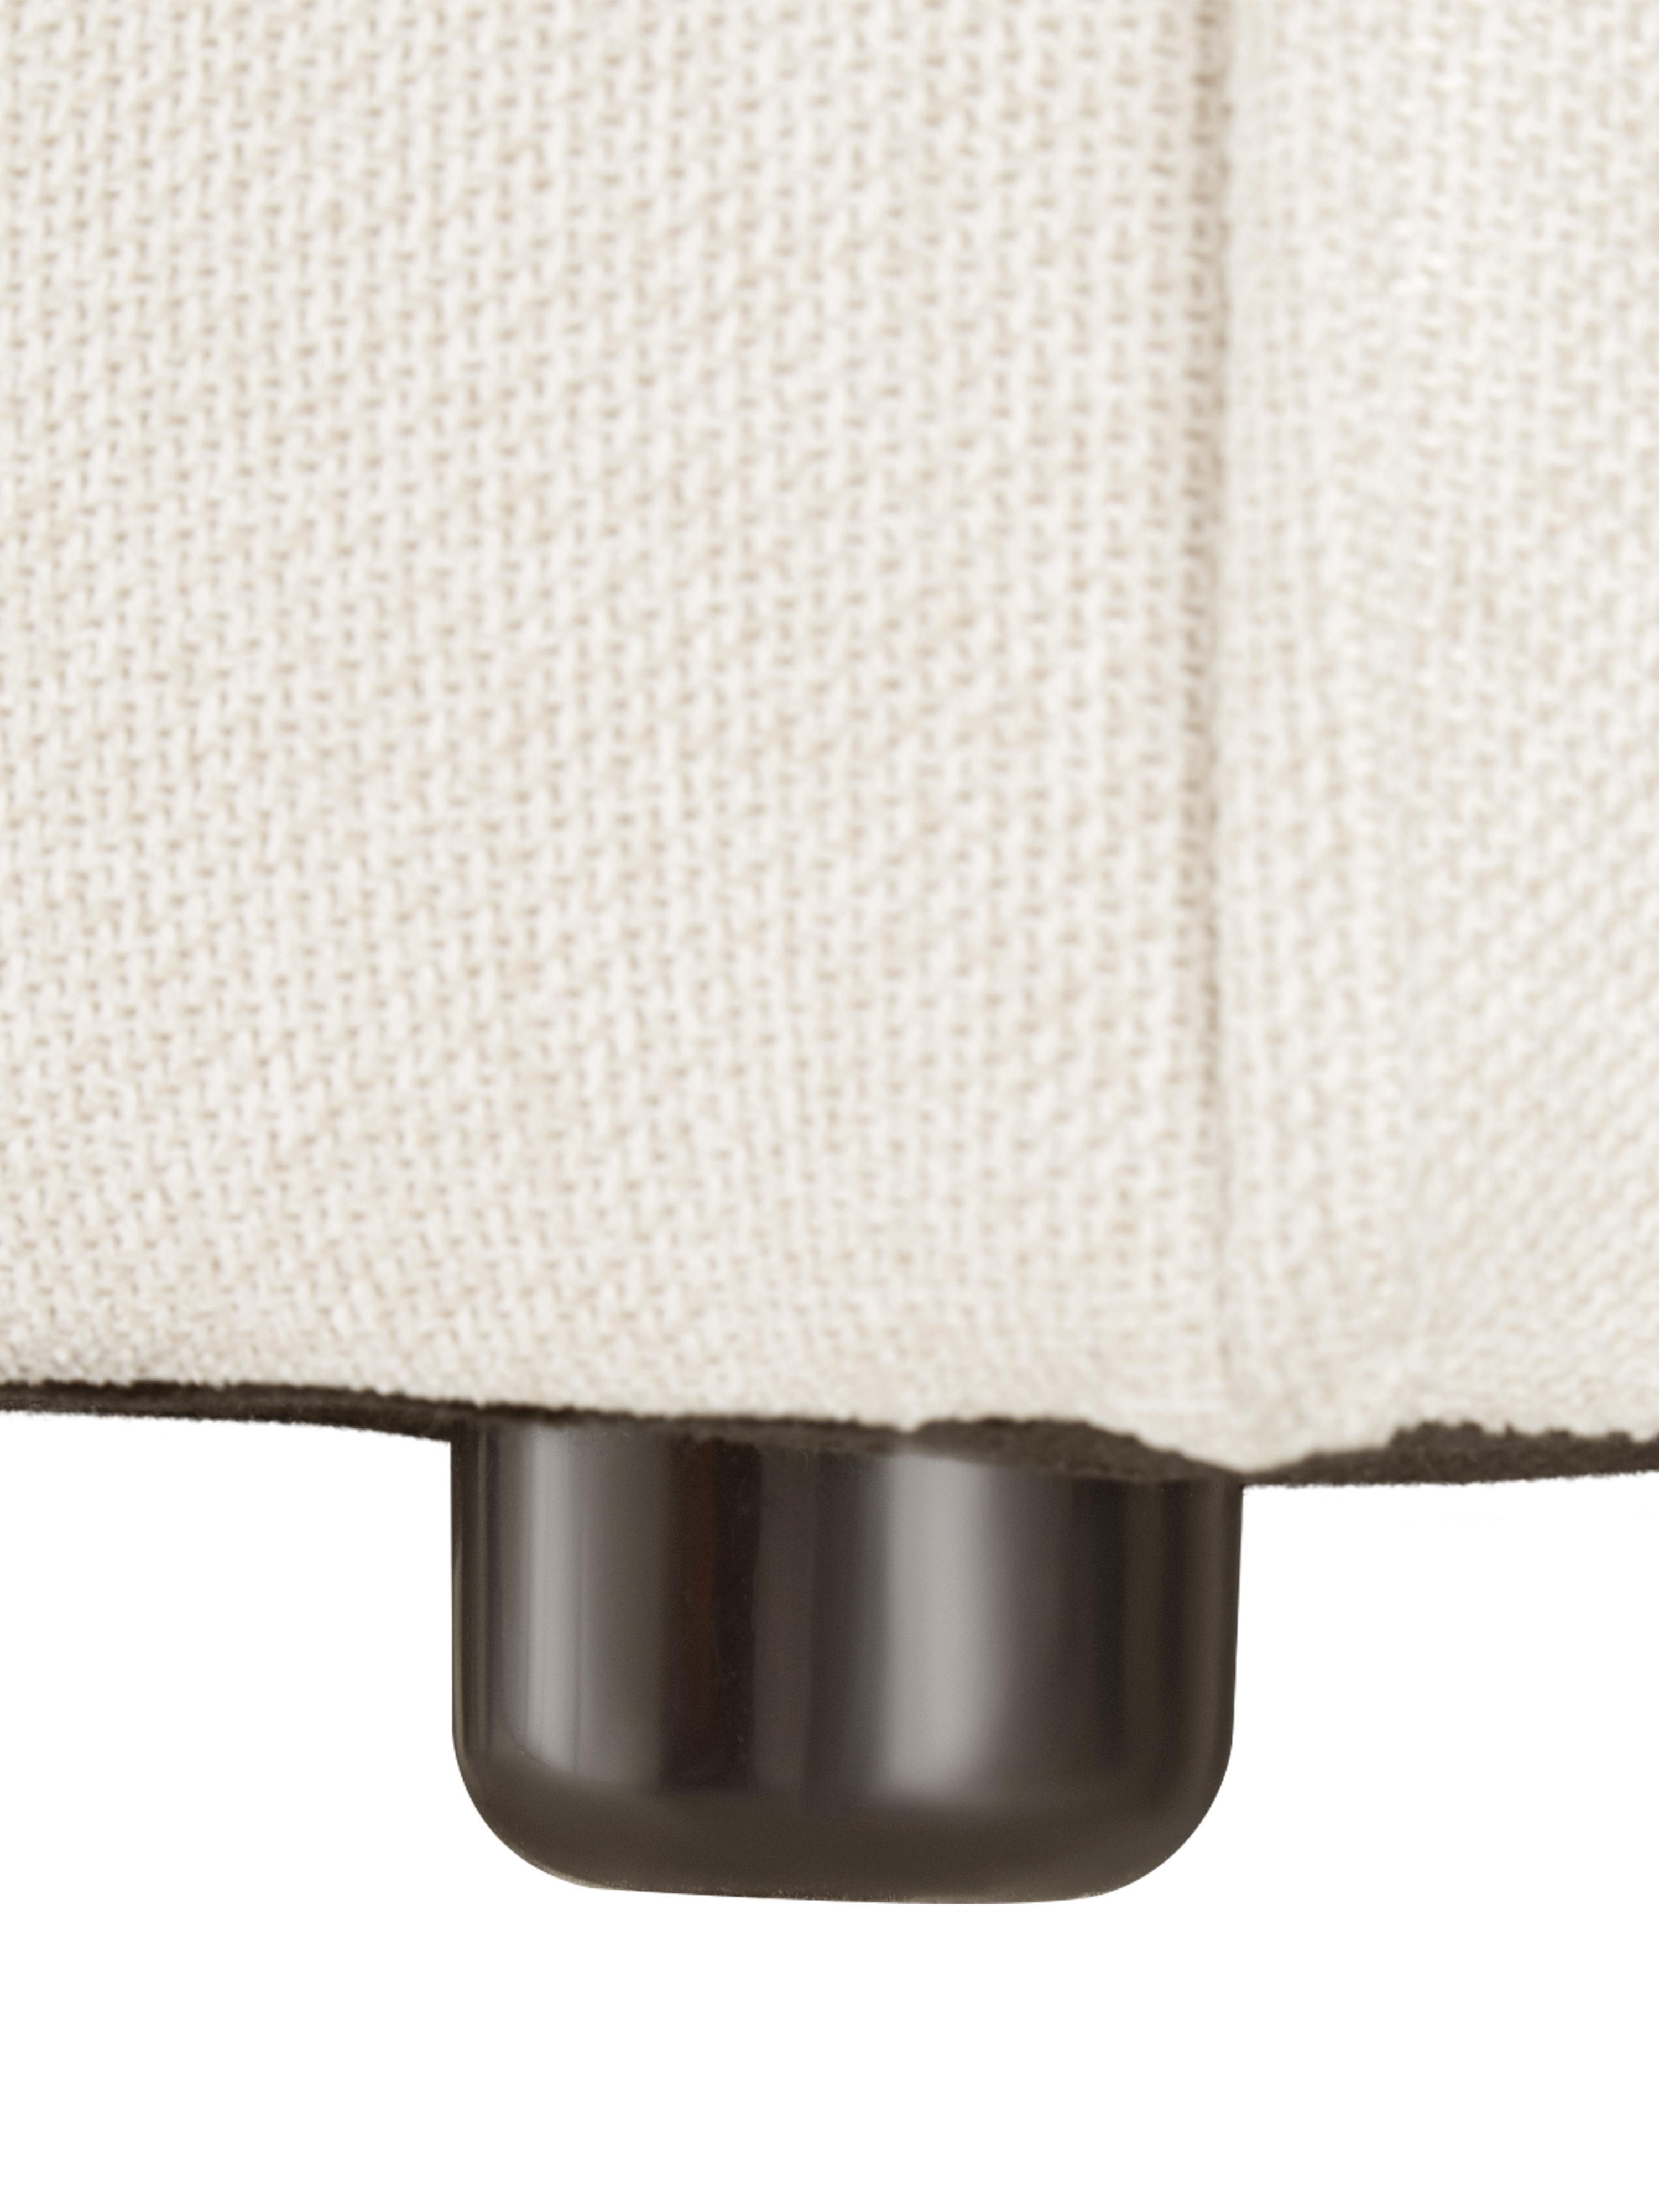 Modulare Ottomane Lennon, Bezug: Polyester Der hochwertige, Gestell: Massives Kiefernholz, Spe, Webstoff Beige, B 269 x T 119 cm